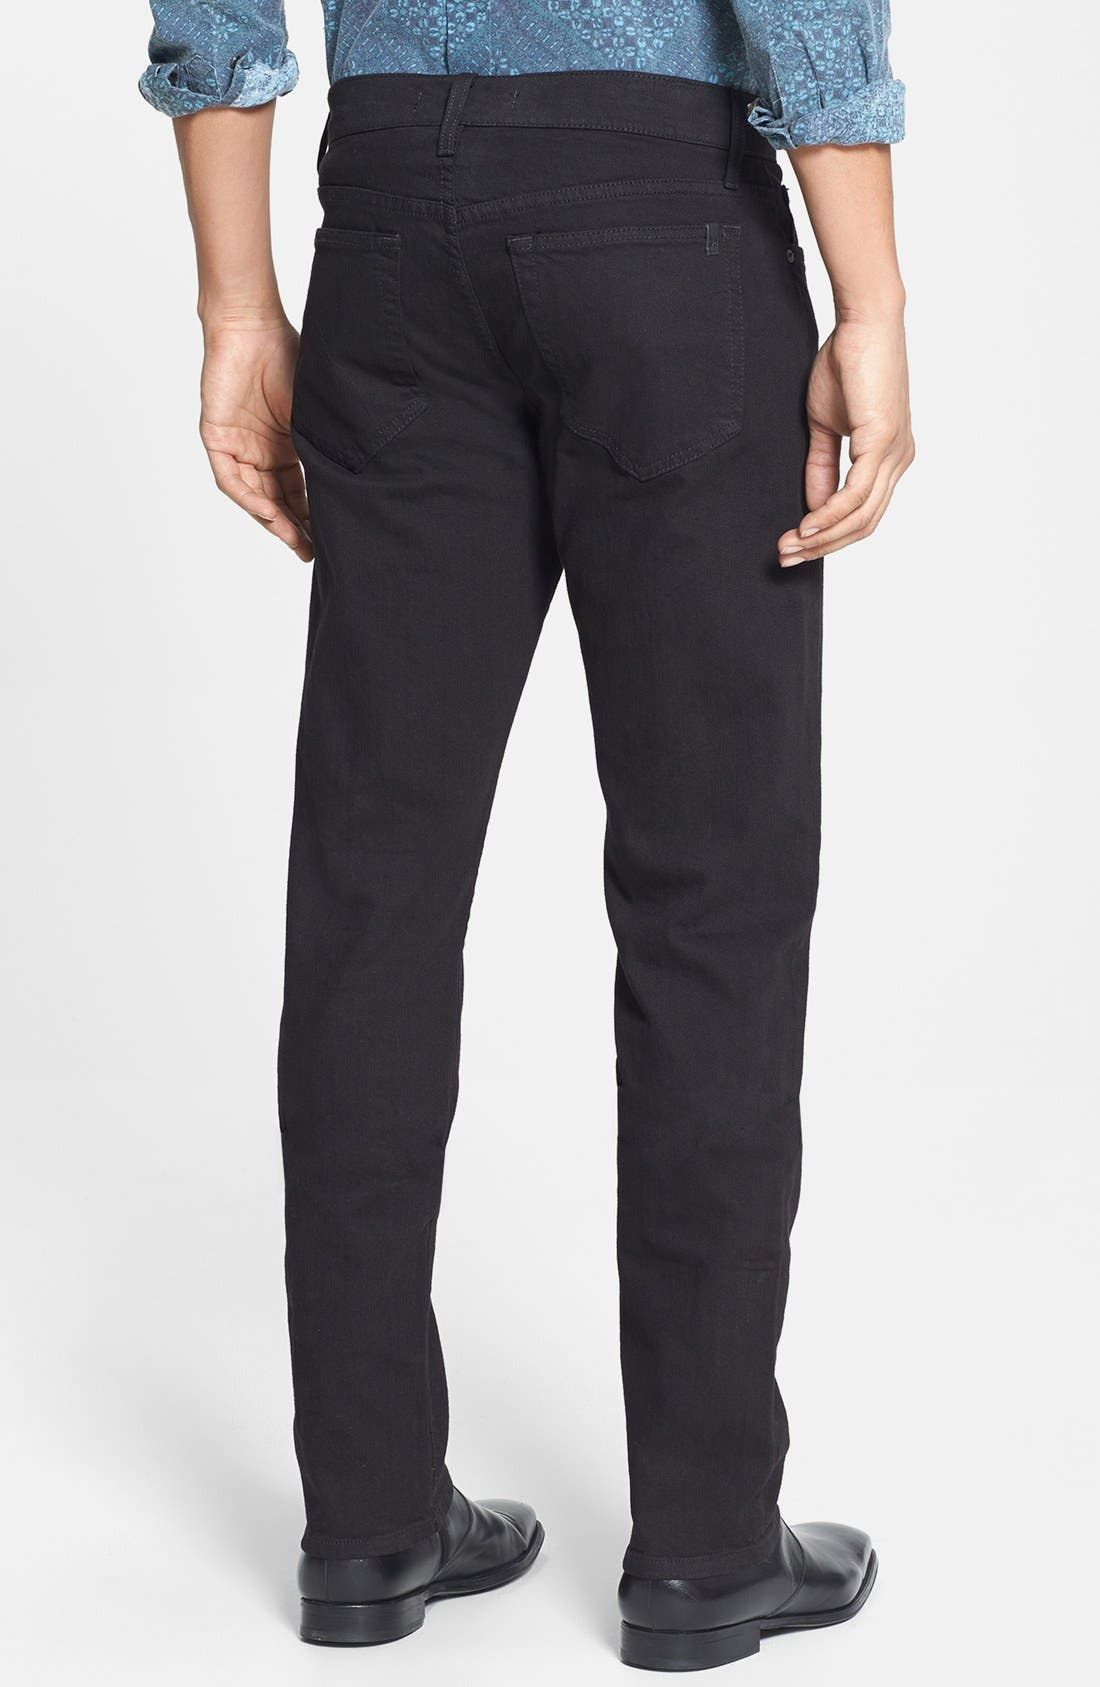 Alternate Image 2  - Joe's 'Brixton' Slim Fit Jeans (Jet Black)